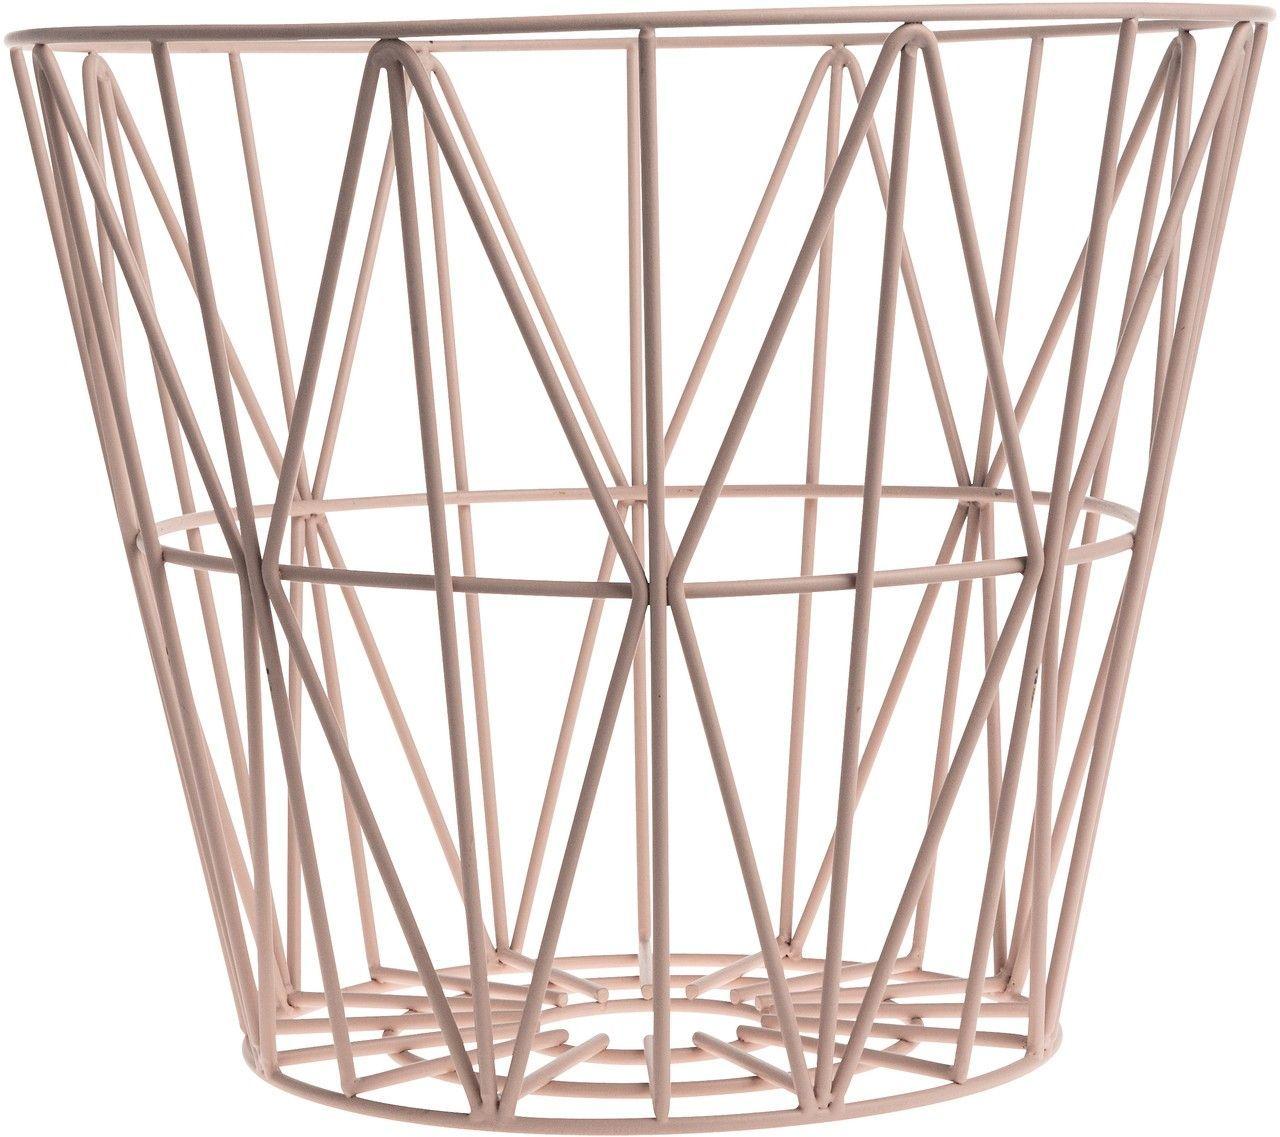 wire basket rose ferm living kleine fabriek. Black Bedroom Furniture Sets. Home Design Ideas